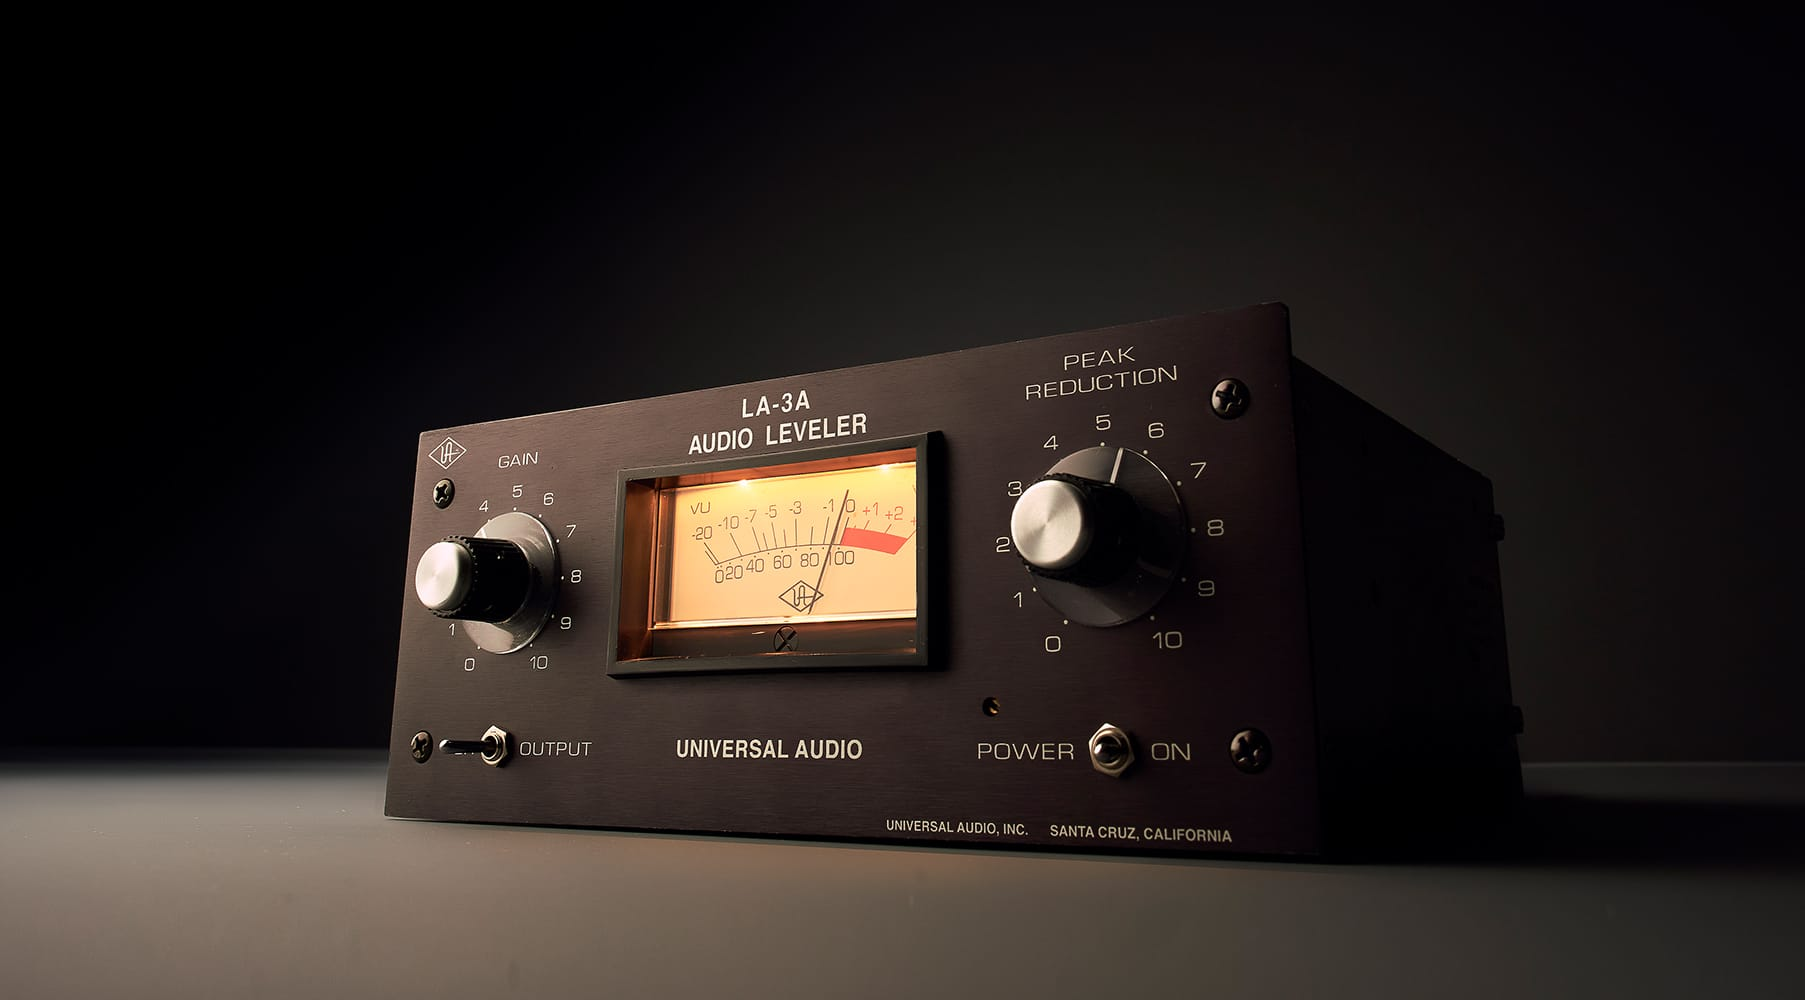 Teletronix® LA-3A Audio Leveler